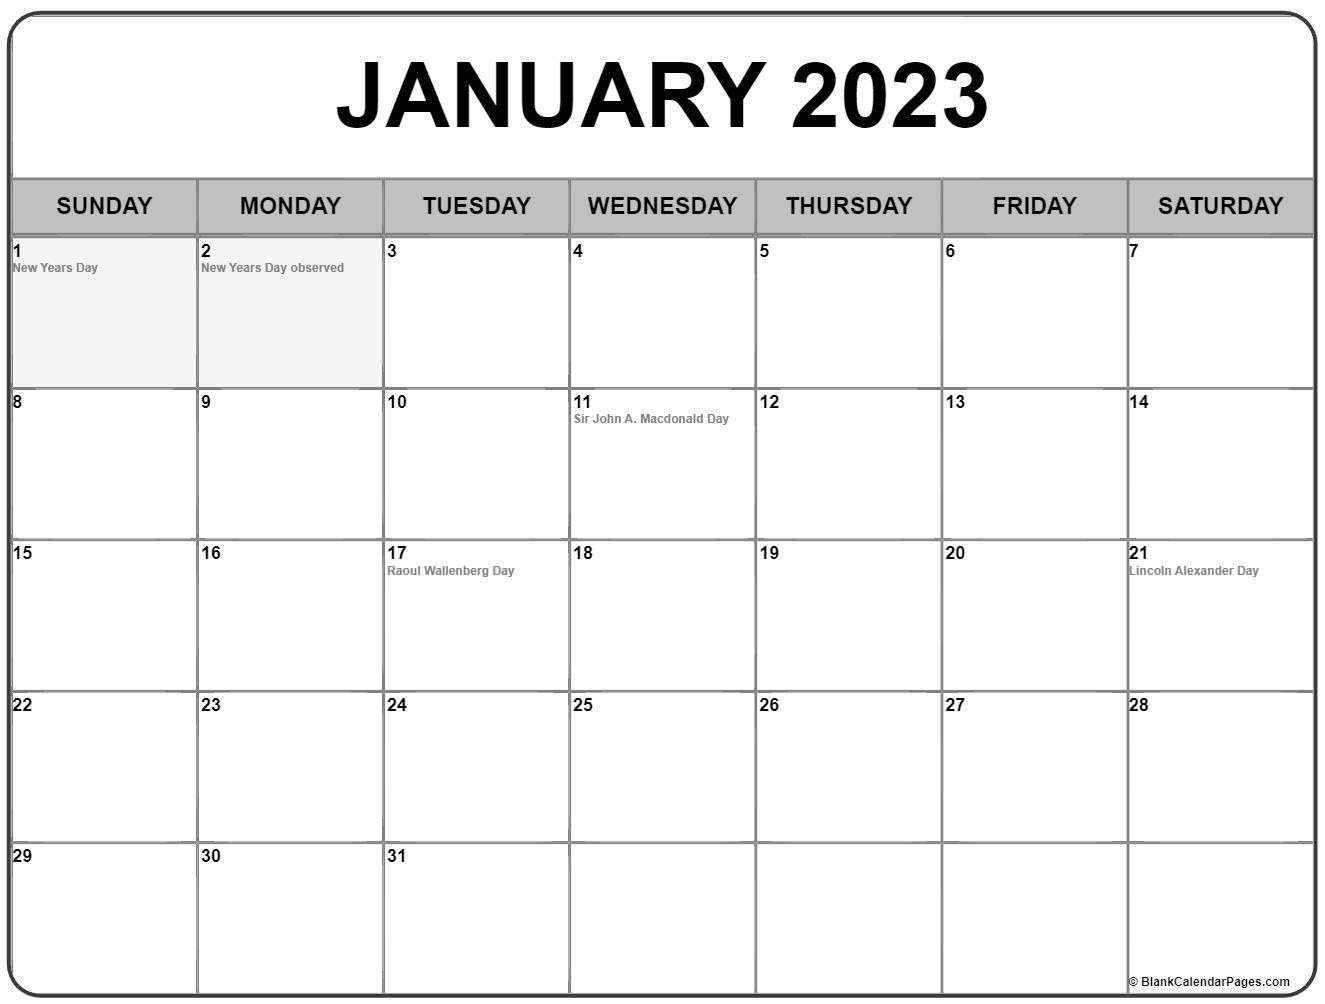 January 2022 calendar with holidays